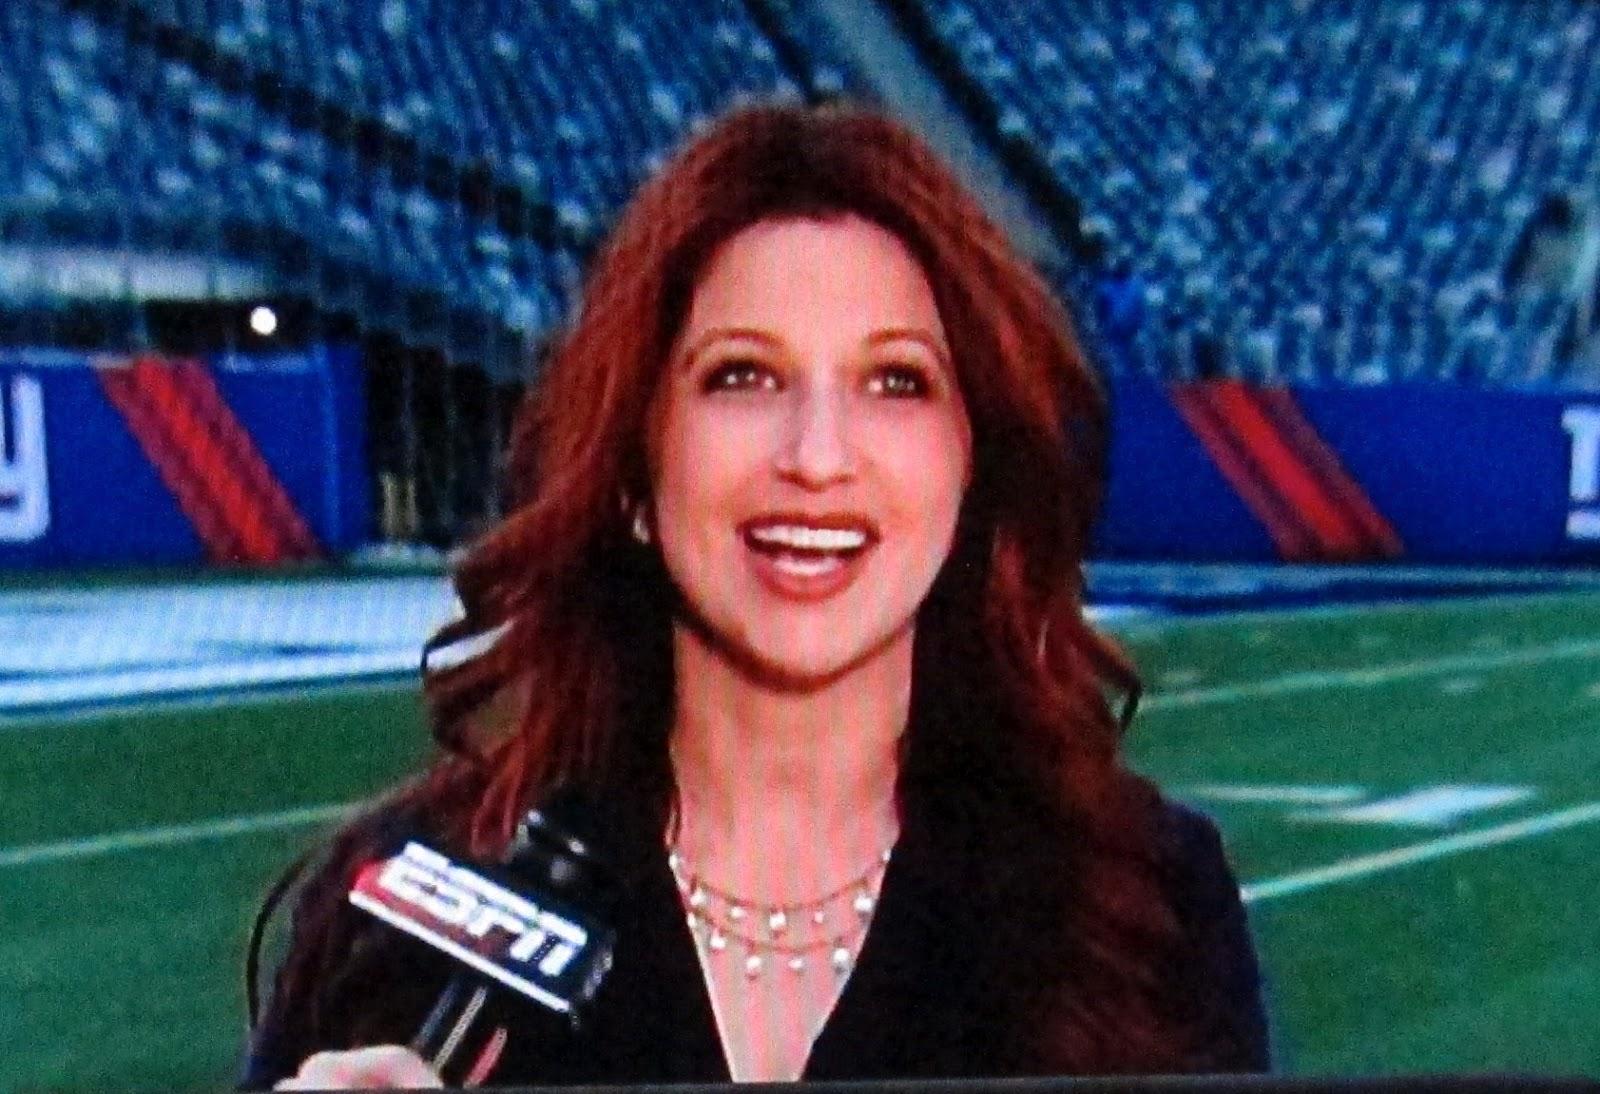 Rachel Nichols ESPN Photos: Rachel Nichols of ESPN talking NFL